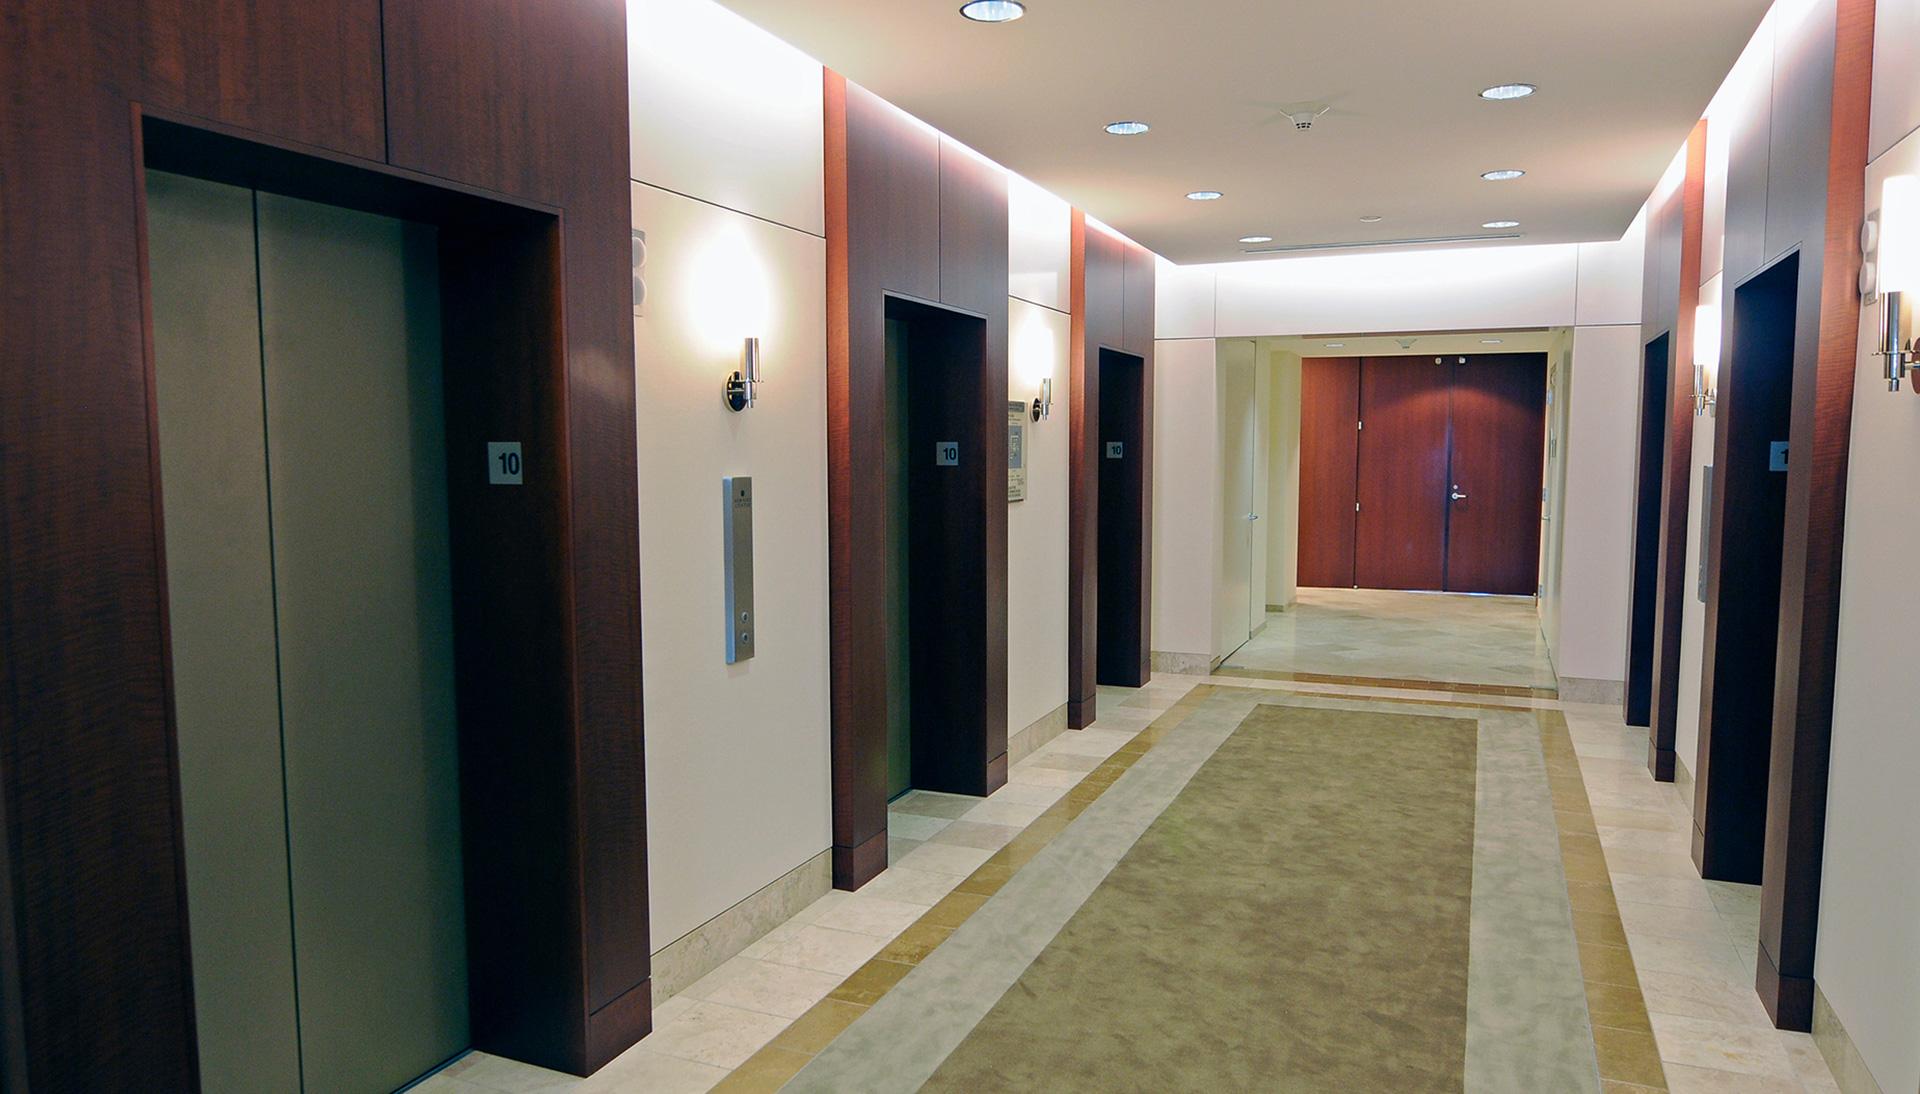 Architectural Design Projects - Elevators